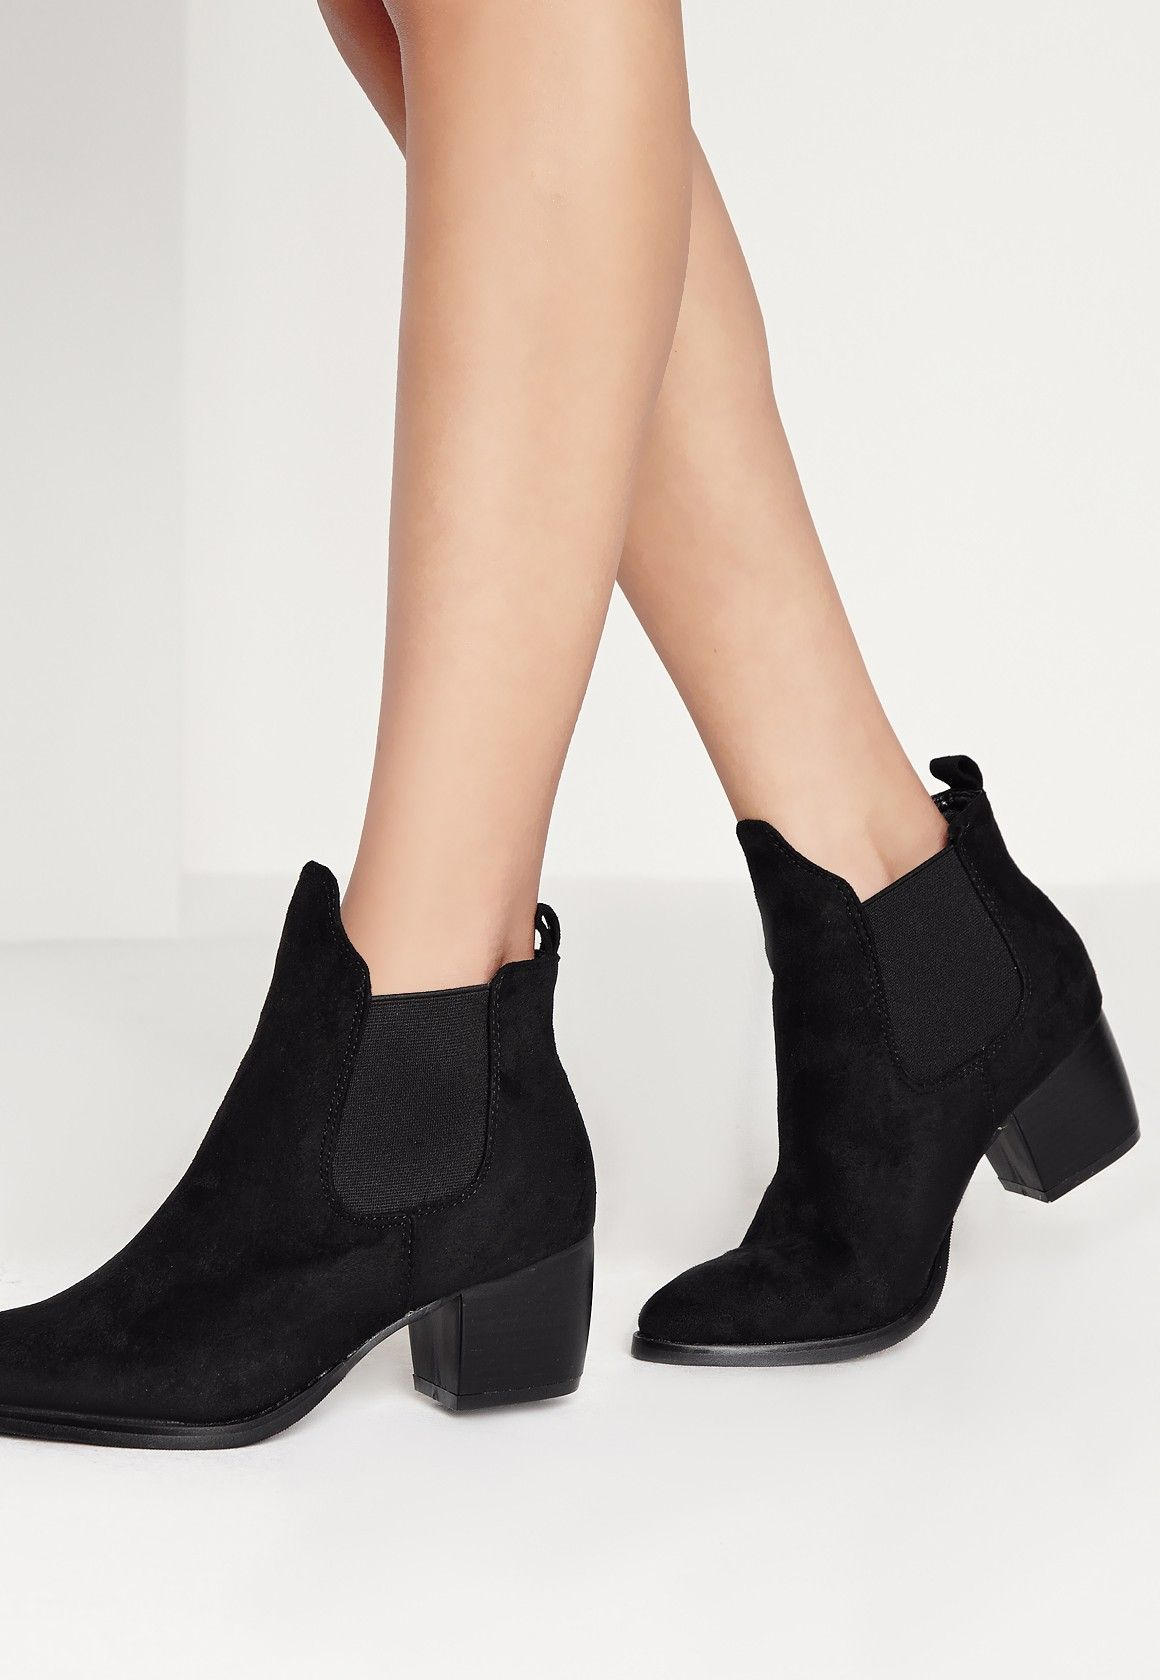 b32c63c26ff2 Missguided - Low Heel Chelsea Boots Black